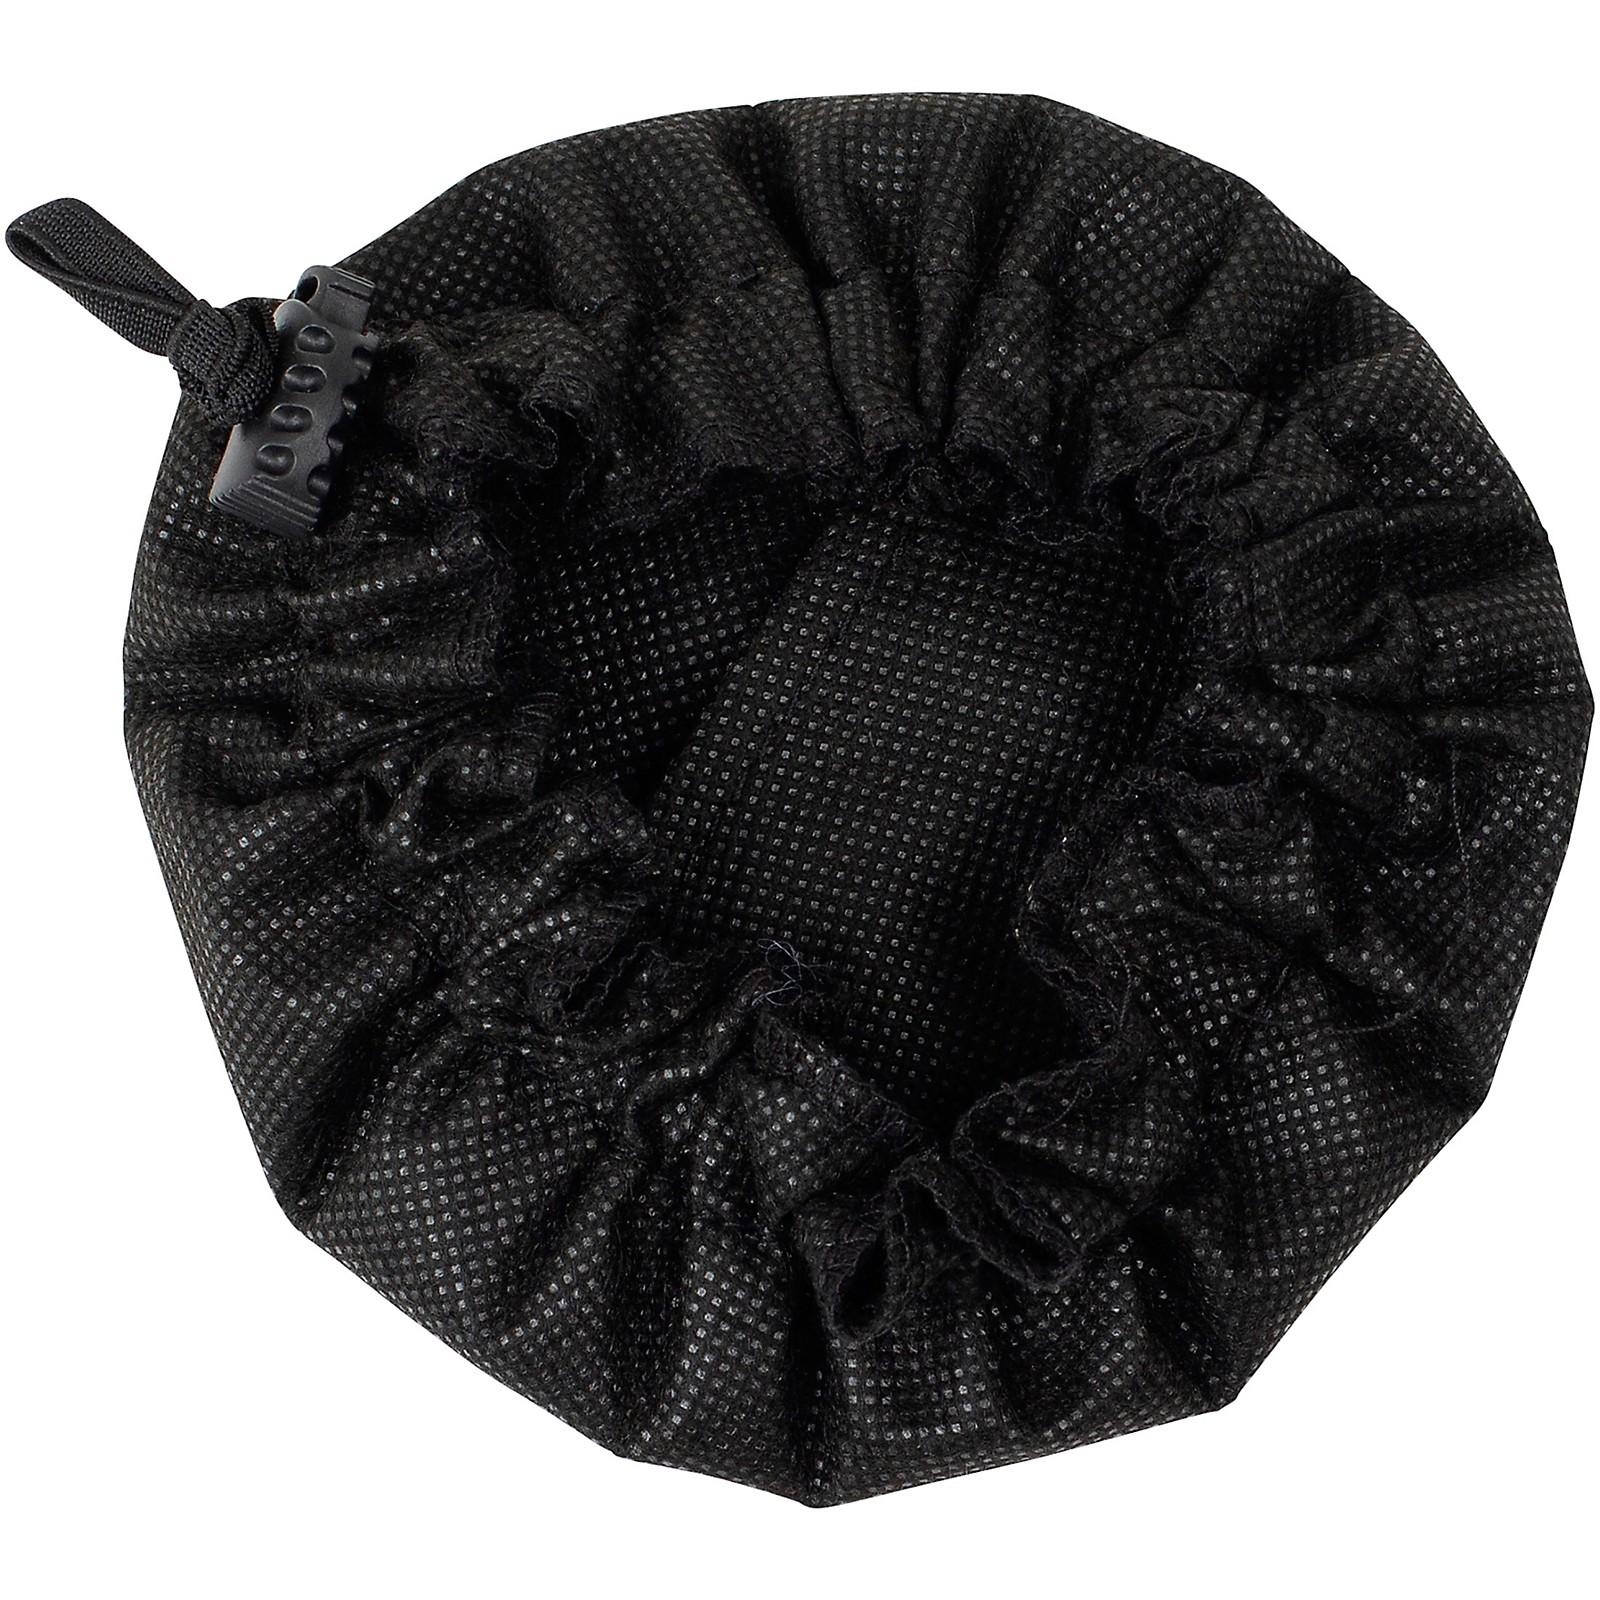 Gator Black Bell Mask With MERV-13 Filter, 6-7